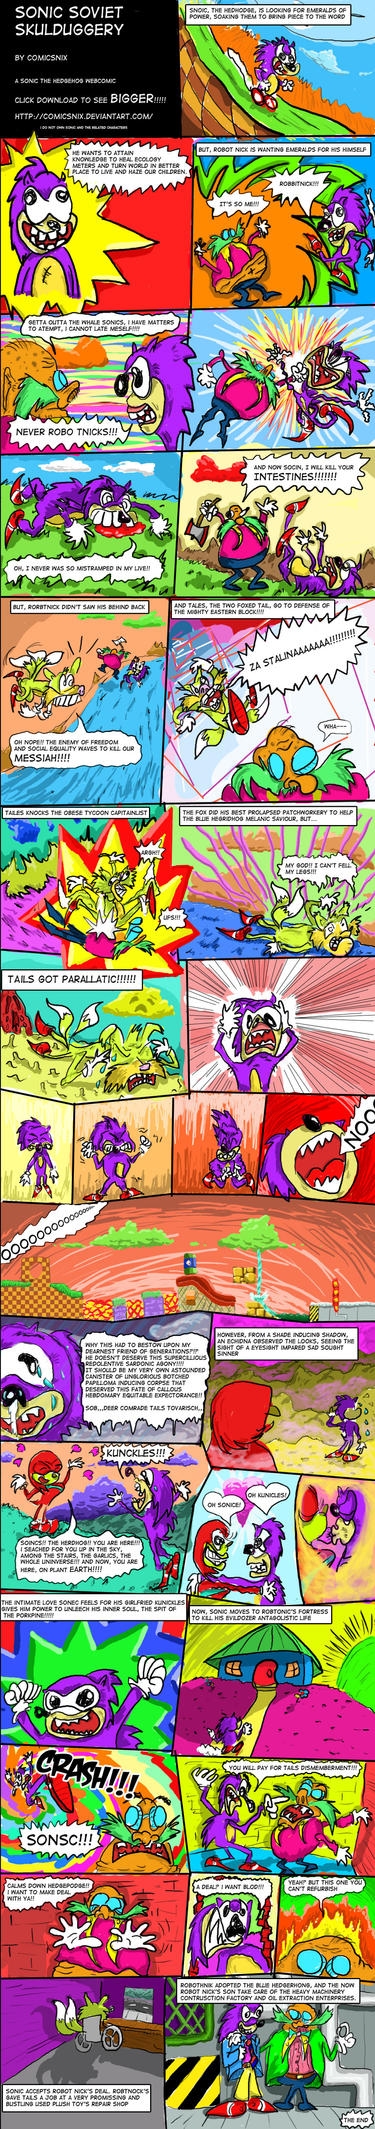 Sonic Soviet Skulduggery by ComicsNix